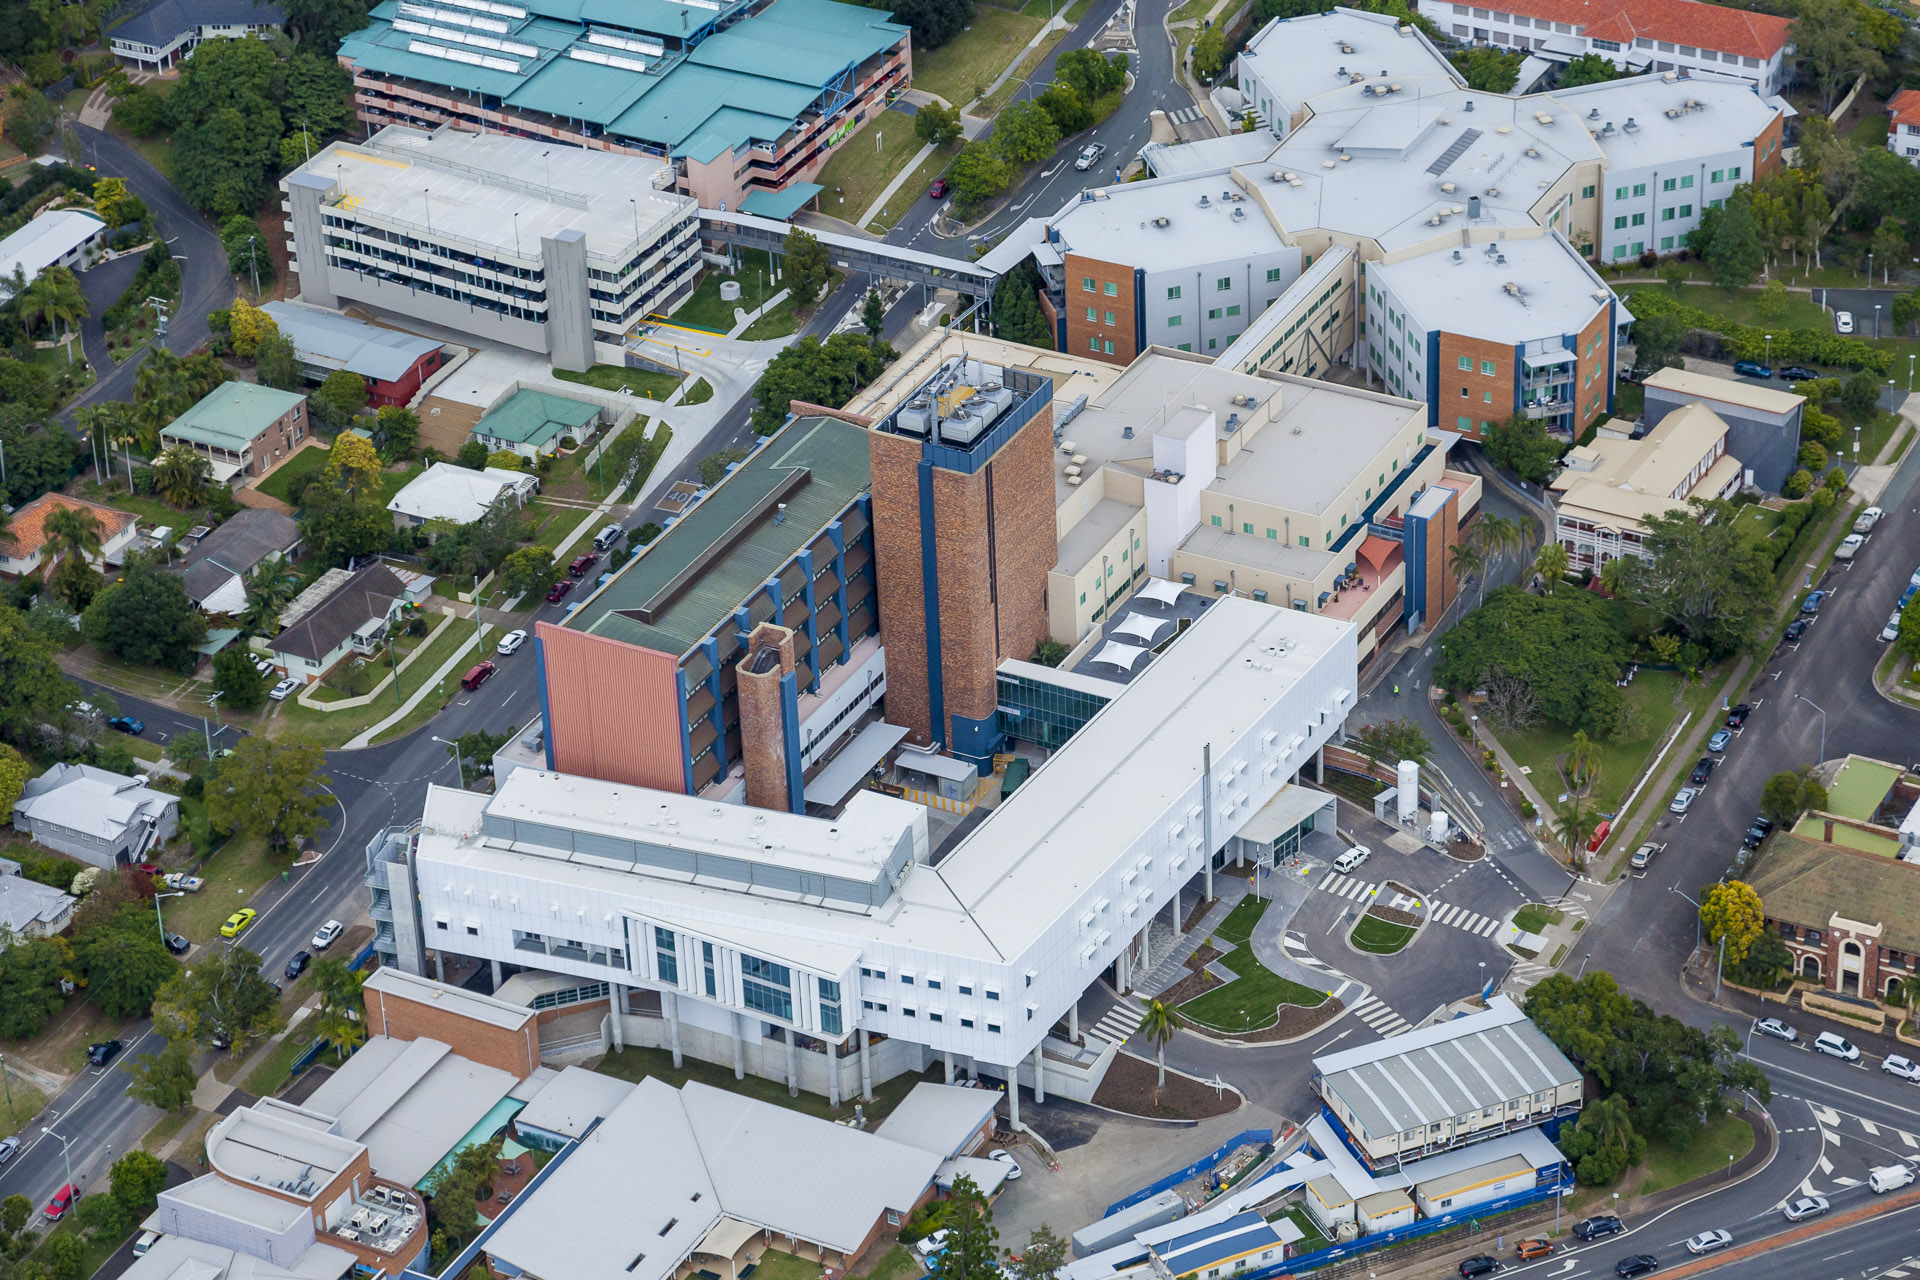 Ipswich Hospital Site